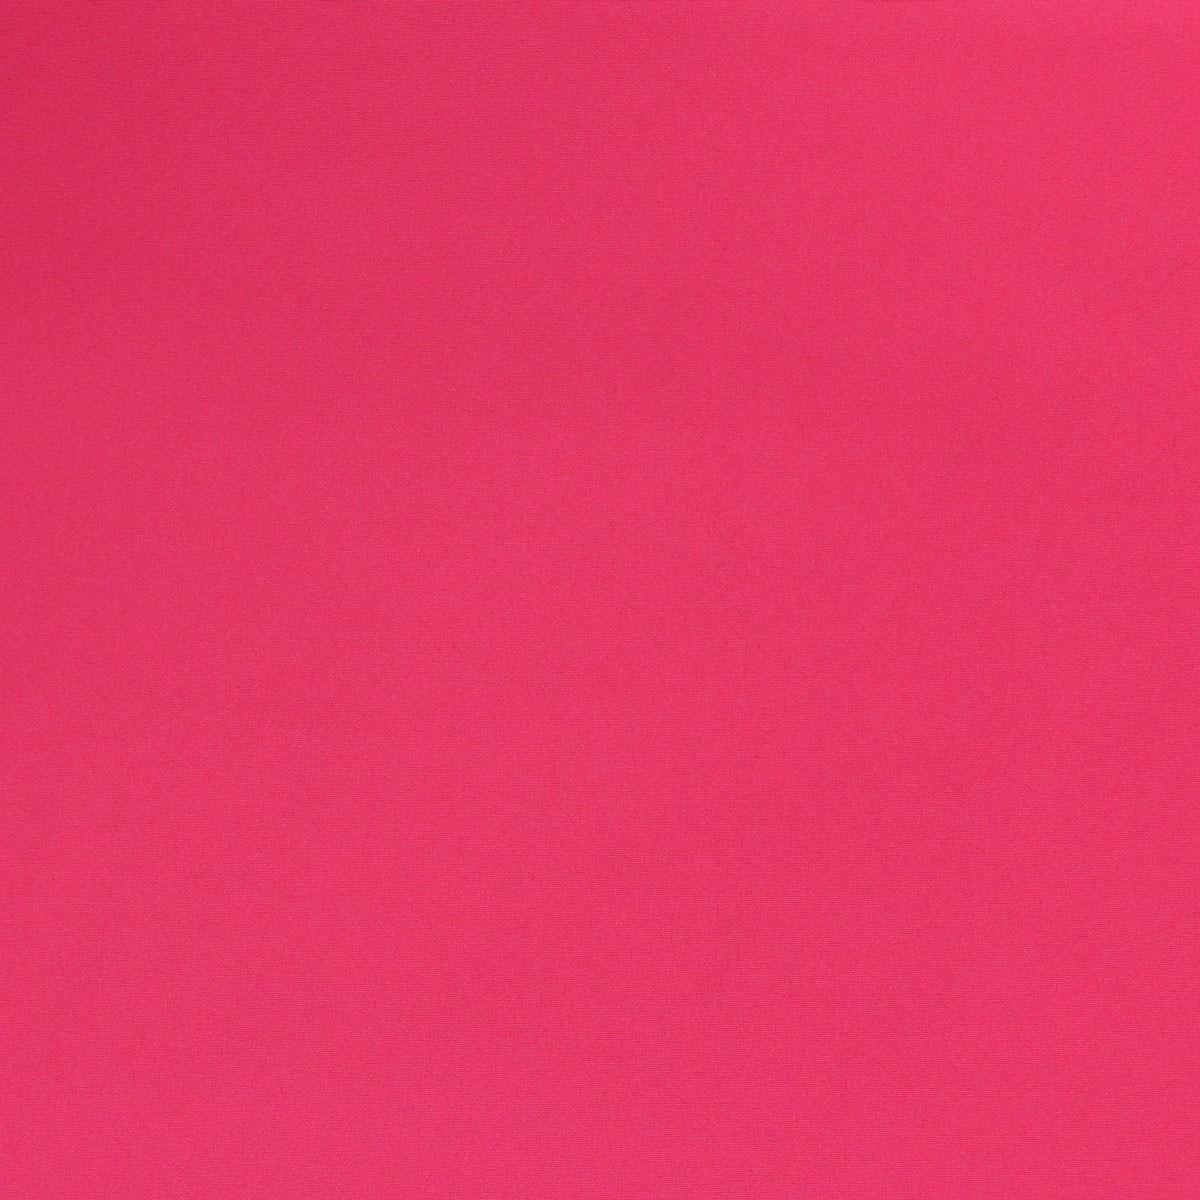 Kreativstoff Universalstoff Polyester Stretch pink